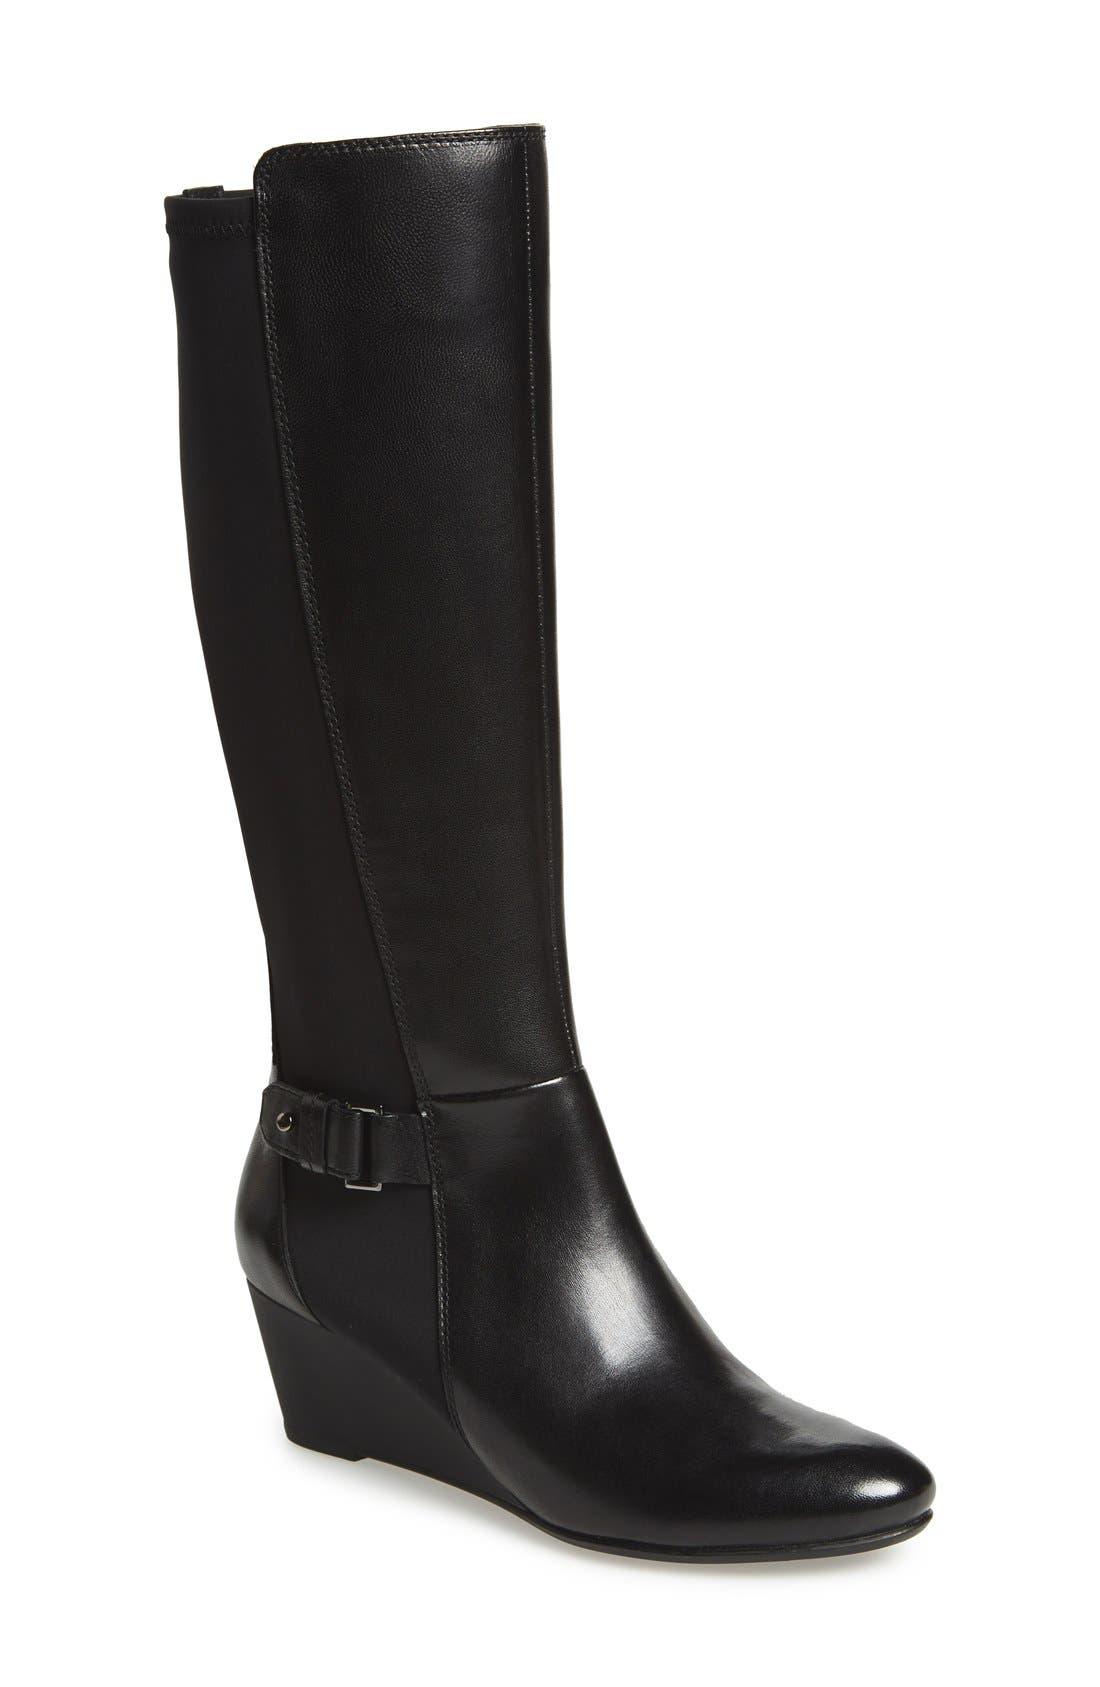 Alternate Image 1 Selected - Geox'Venere' Tall Wedge Boot (Women)